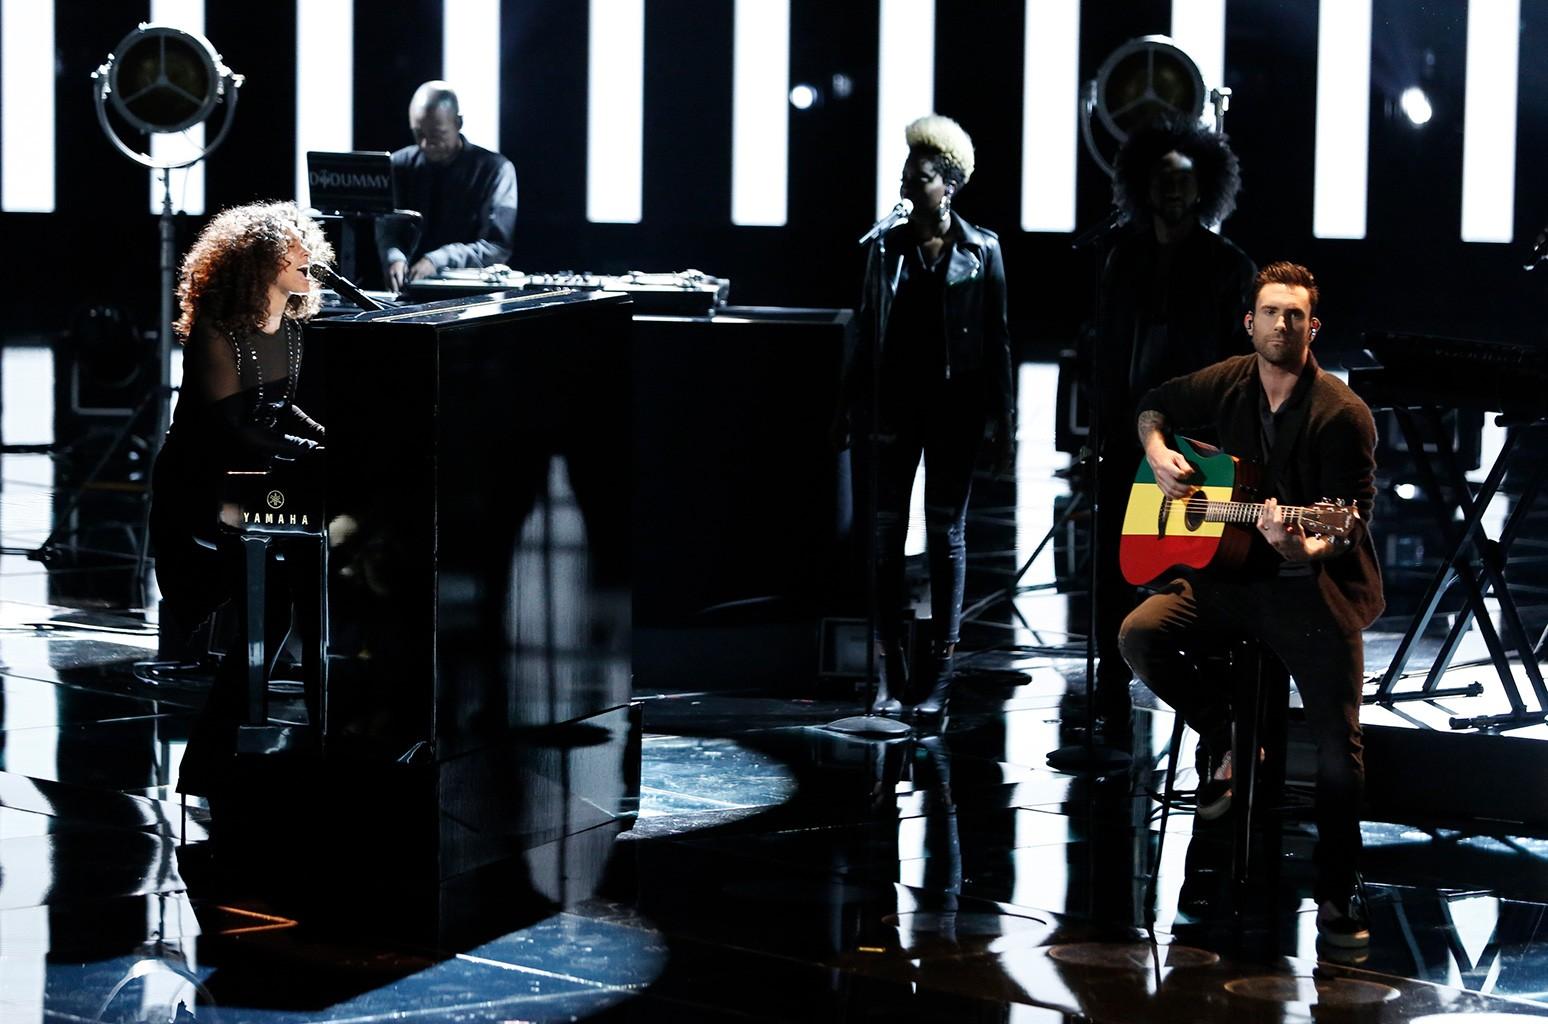 Alicia Keys and Adam Levine perform on The Voice on Nov. 15, 2016.